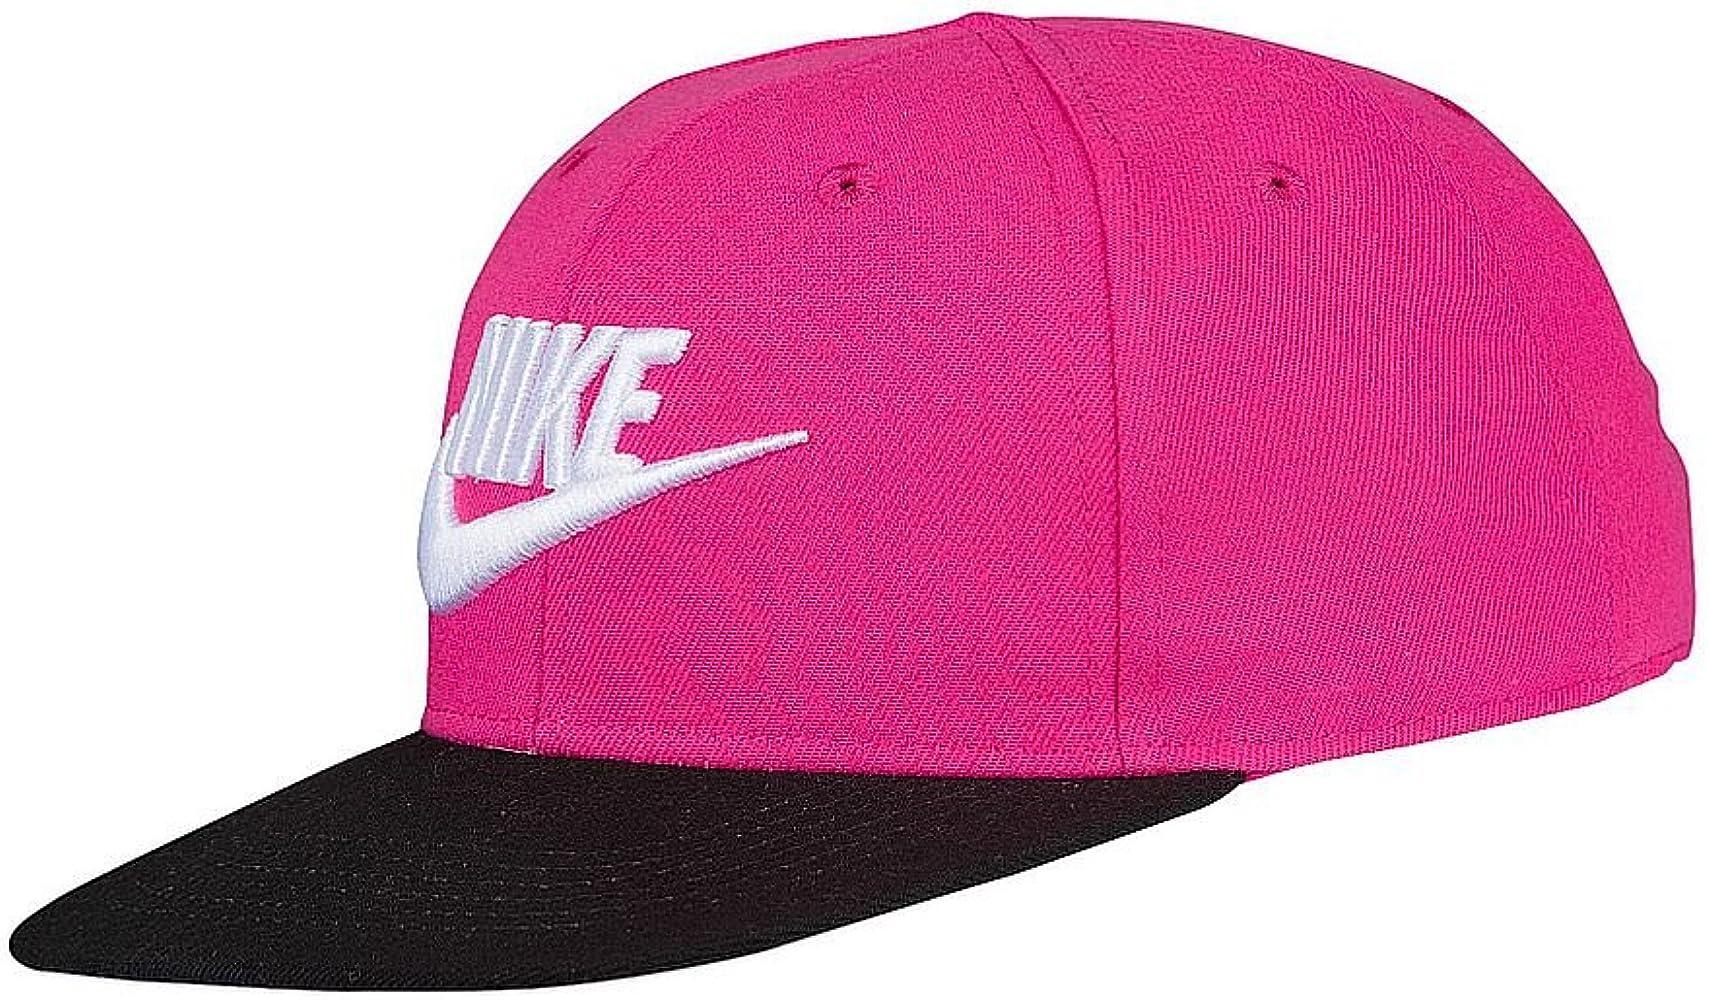 Nike 2560S-A3C Gorra, Sin género, Blanco, Talla Única: Amazon.es ...